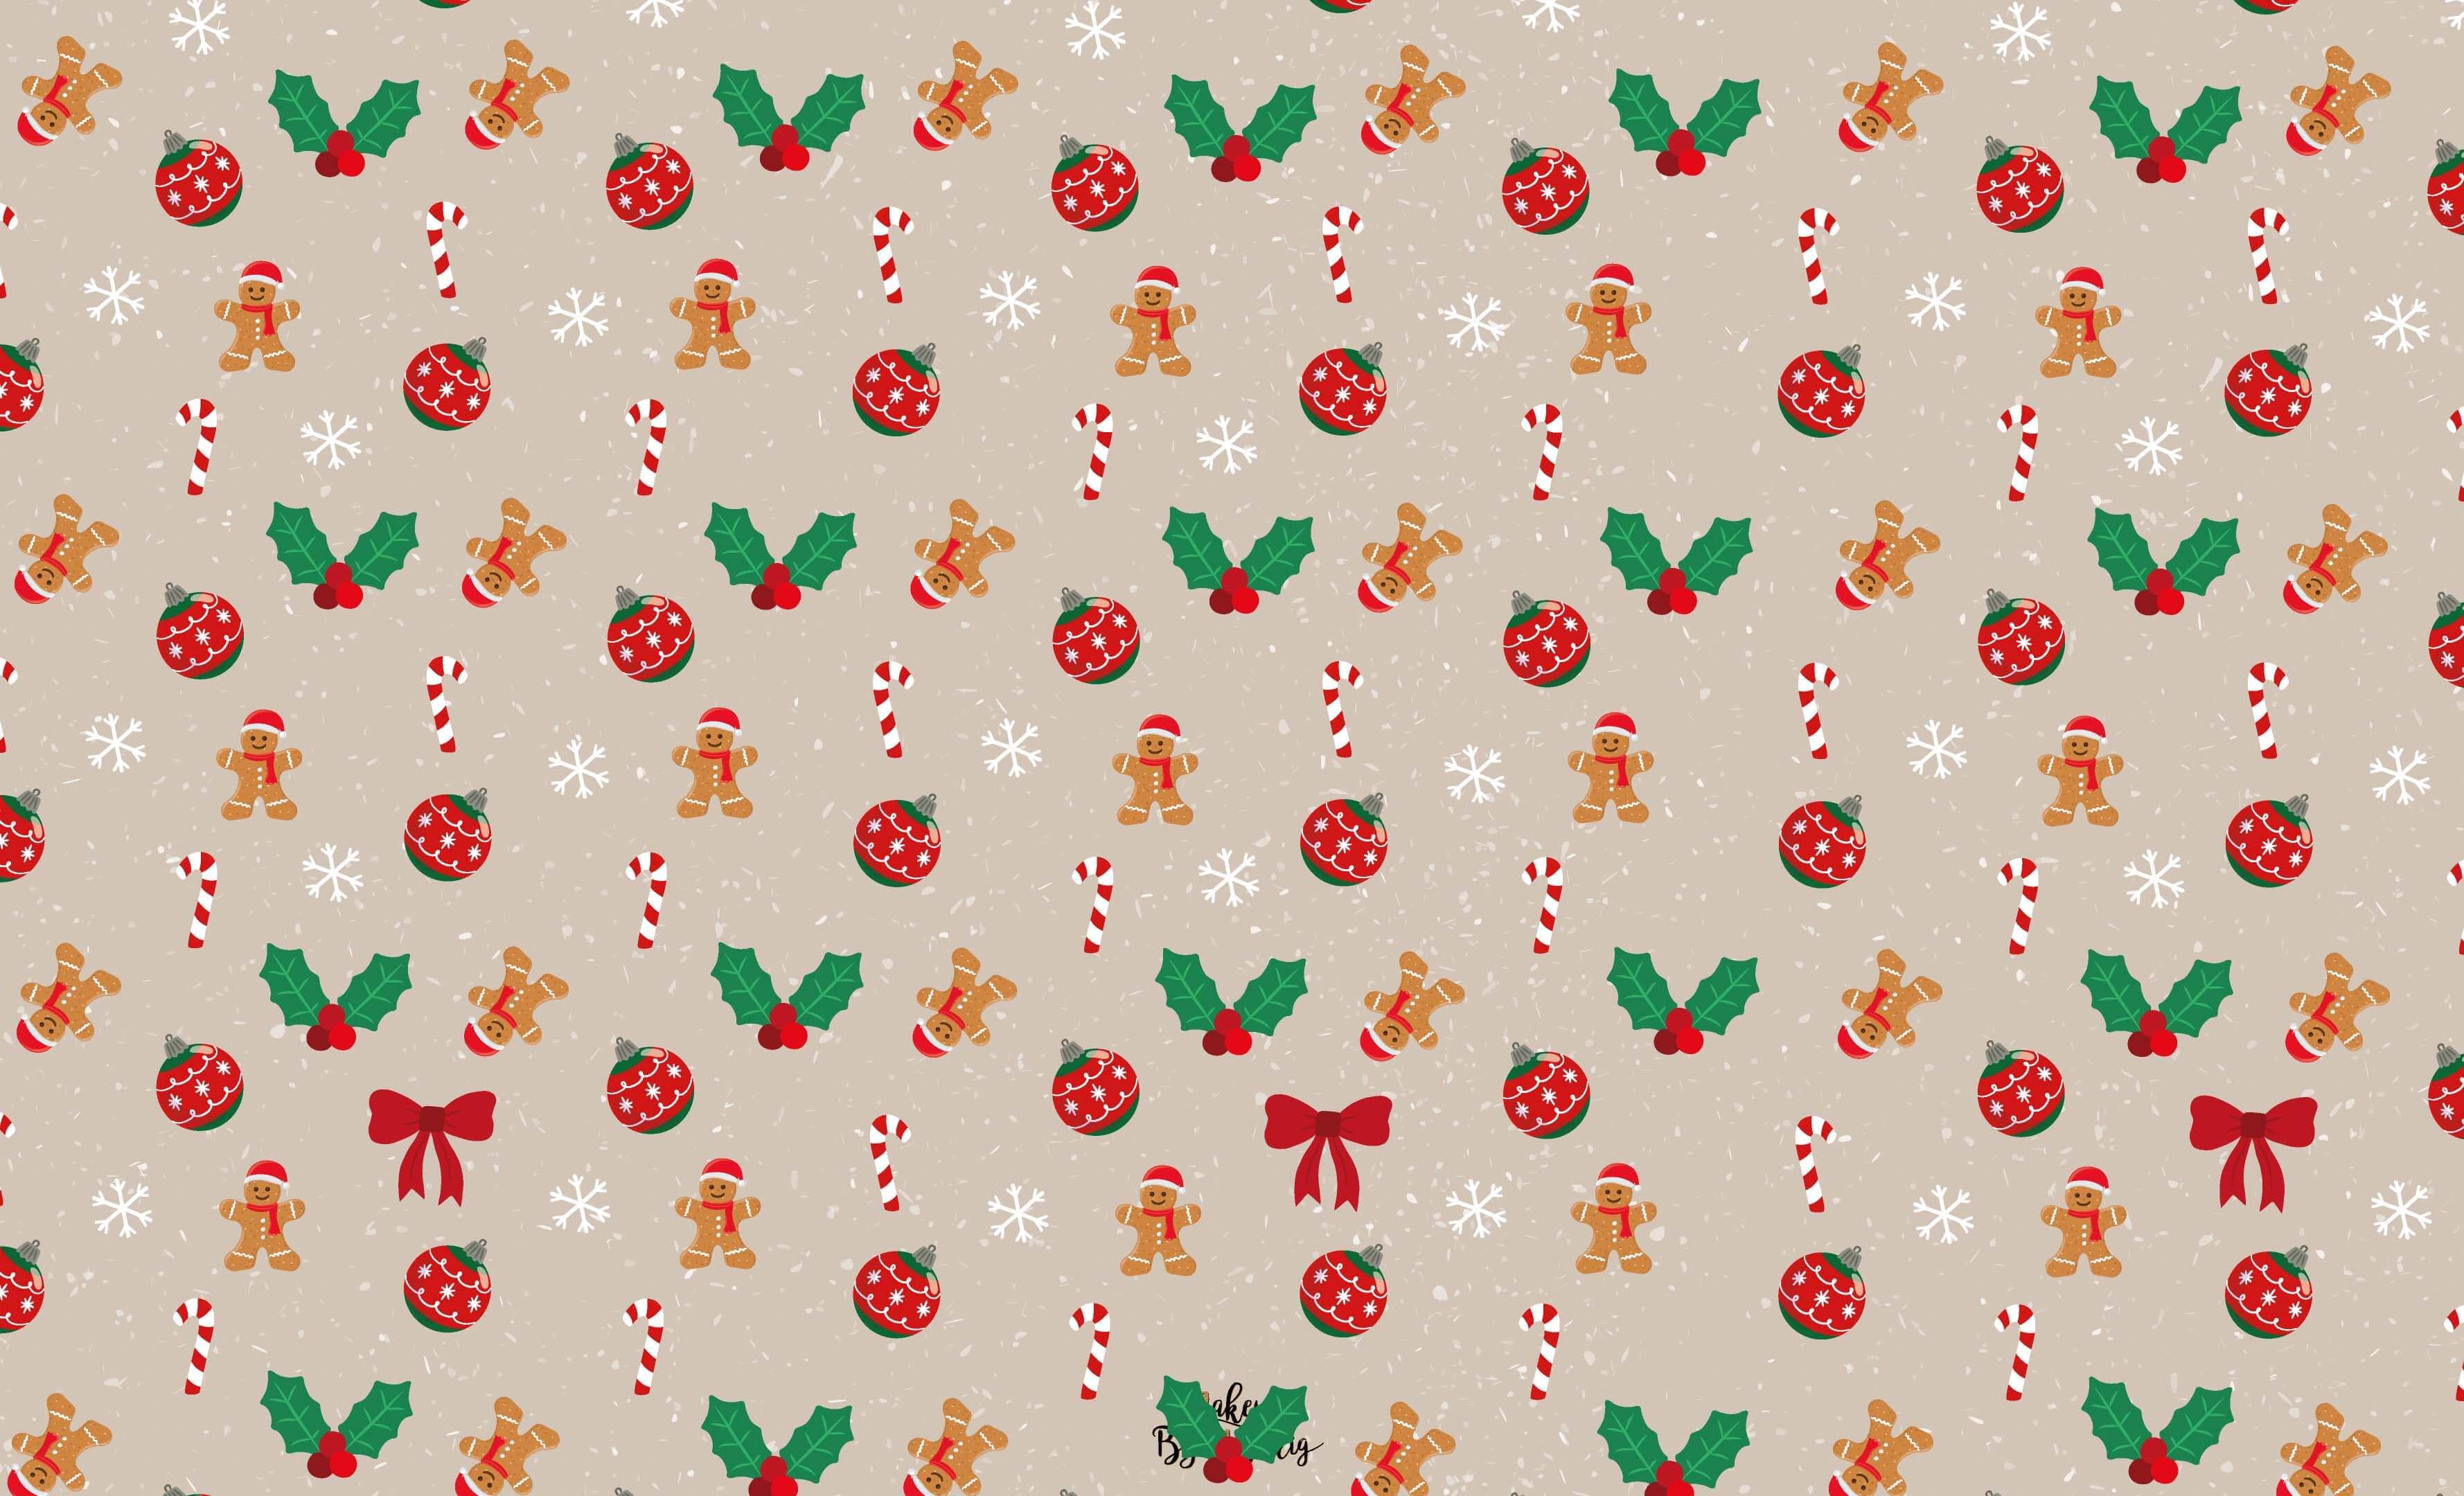 fond-decran-wallpaper-christmas-noel-elements-gingerbread-houx-decoration-december-ordinateur-mac-macbook-imac-pc-makeupbyazadig-tendance